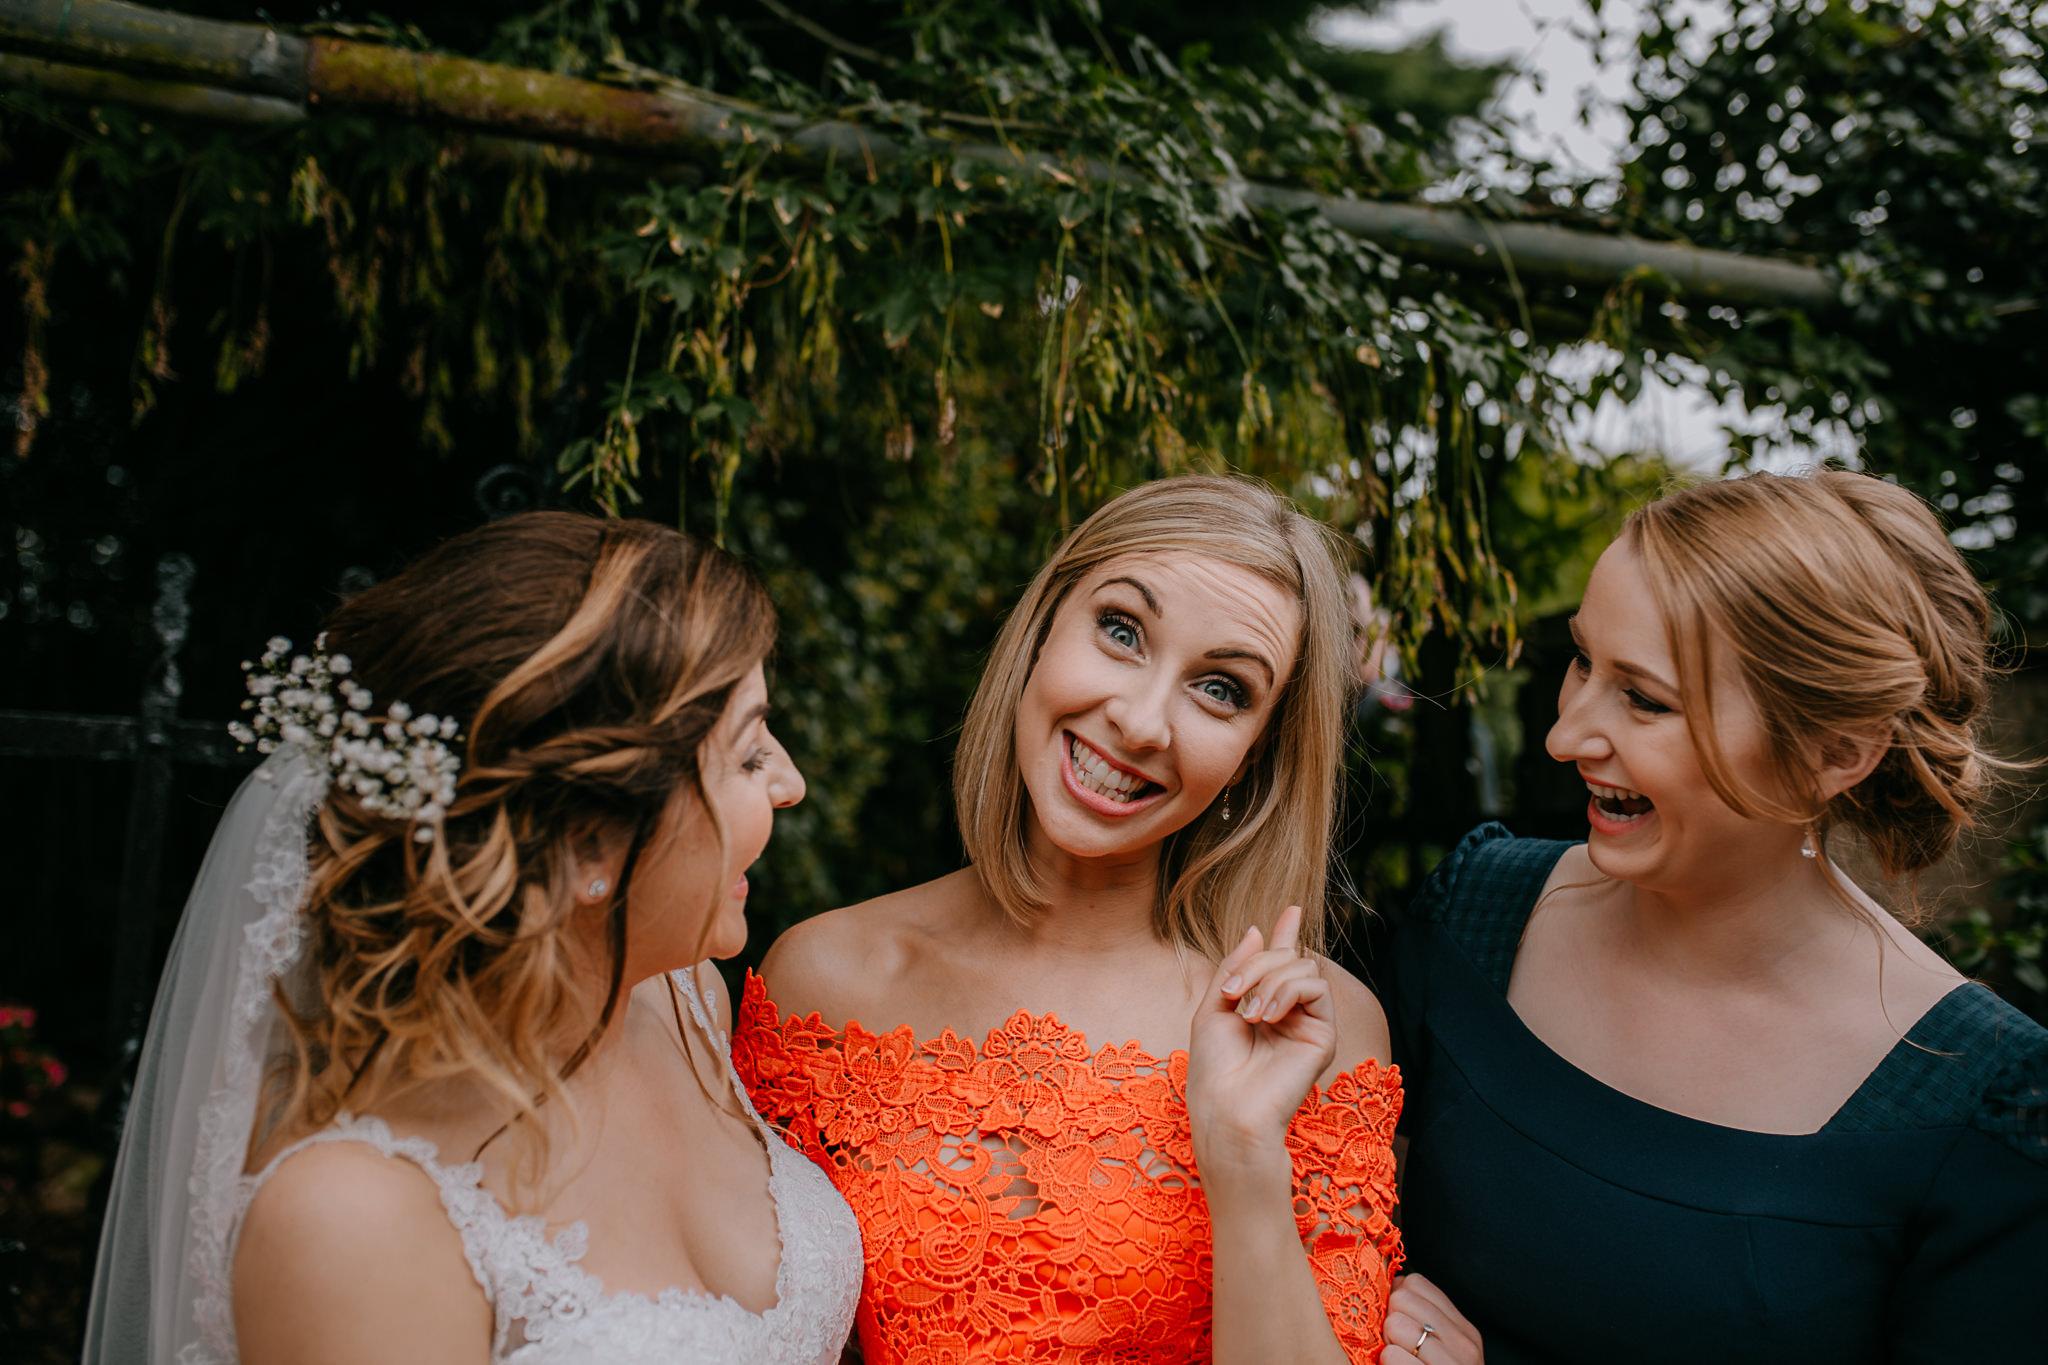 Northern-Ireland-wedding-photographers-the-martins-outdoor-barn-wedding-115.jpg